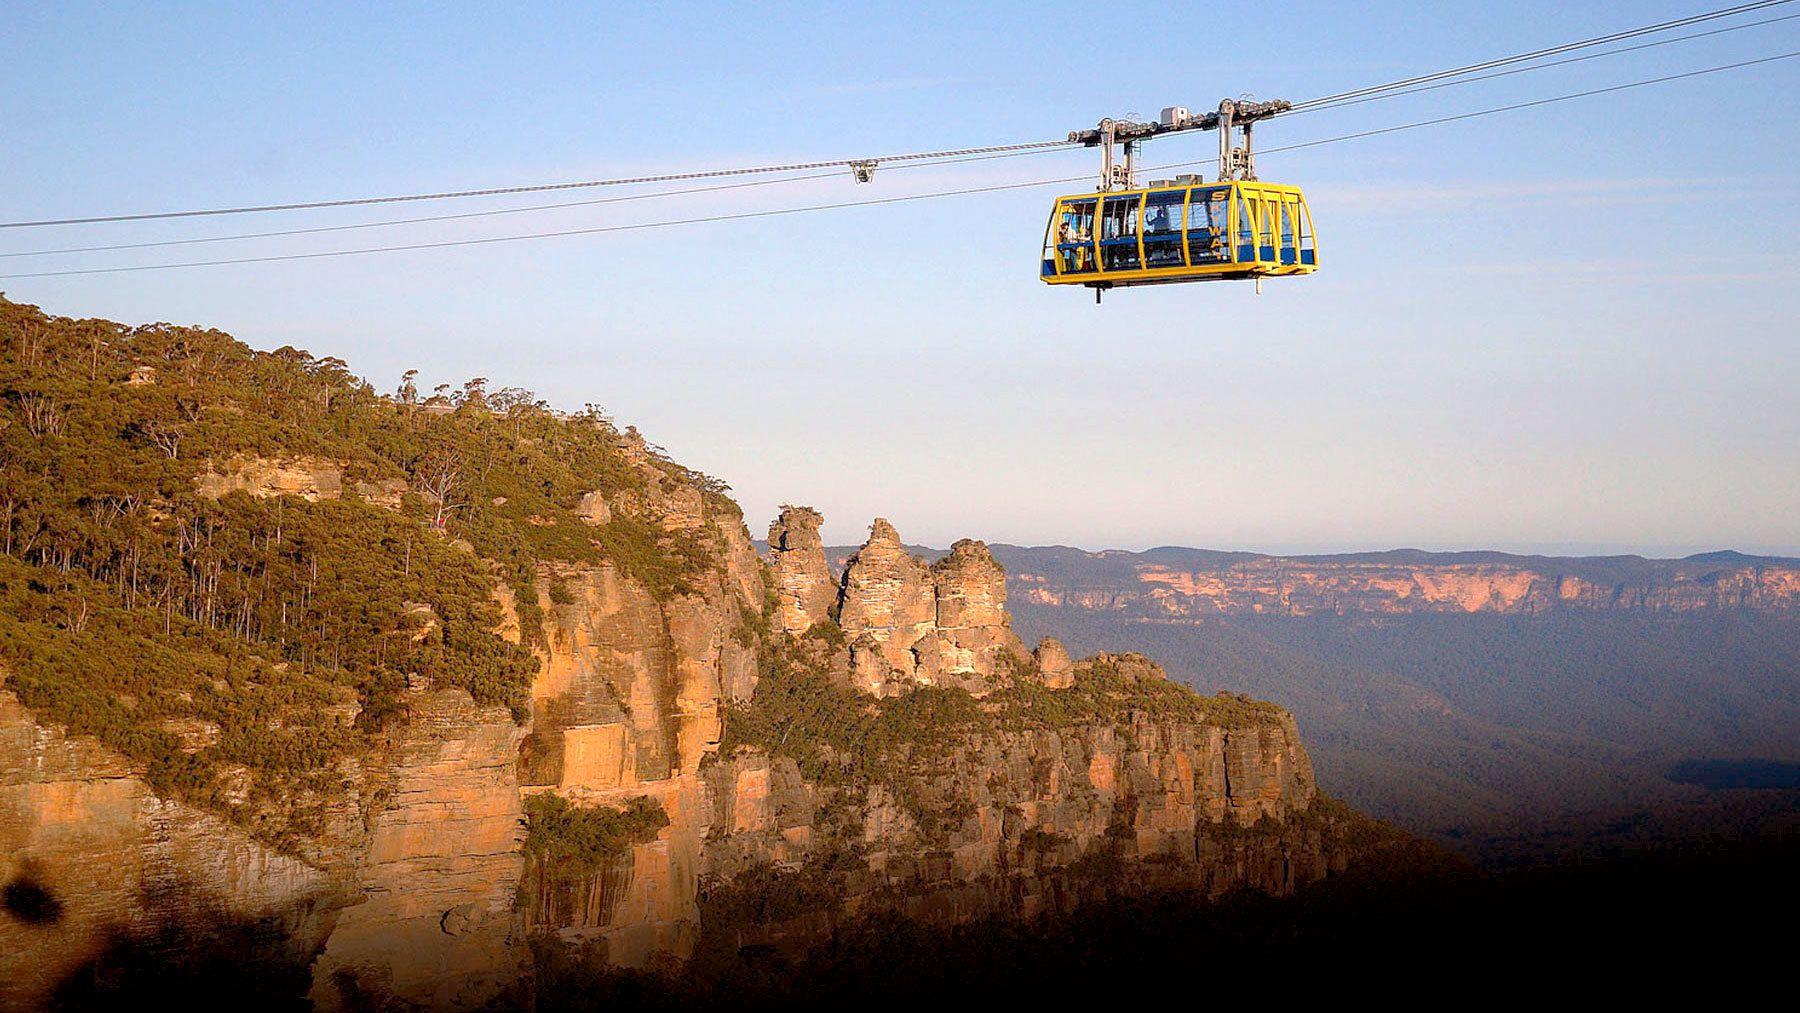 Gondola over the scenic Blue Mountains in Australia